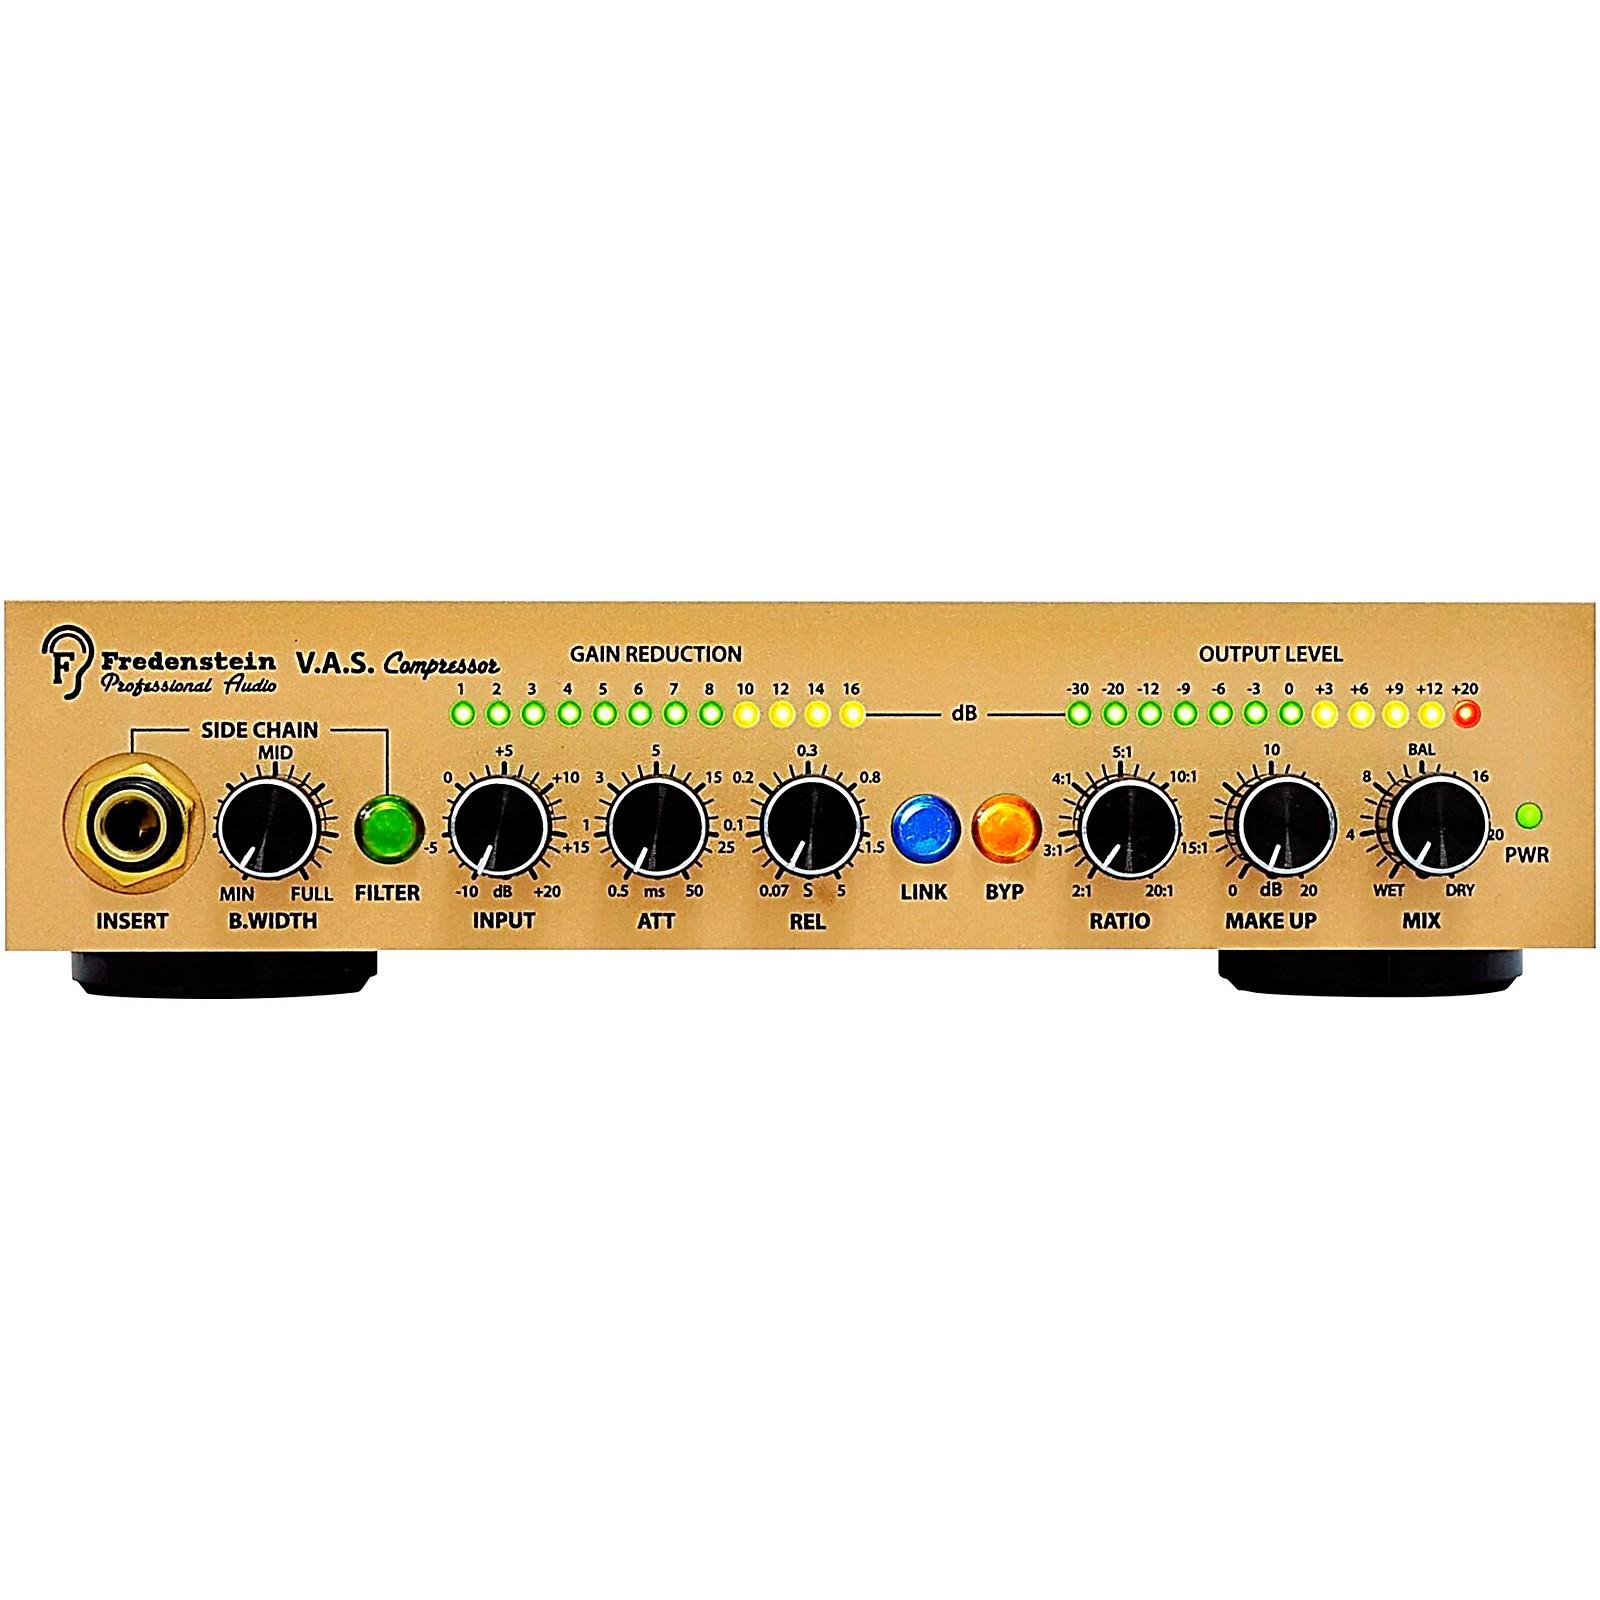 Fredenstein Professional Audio V.A.S. Compressor